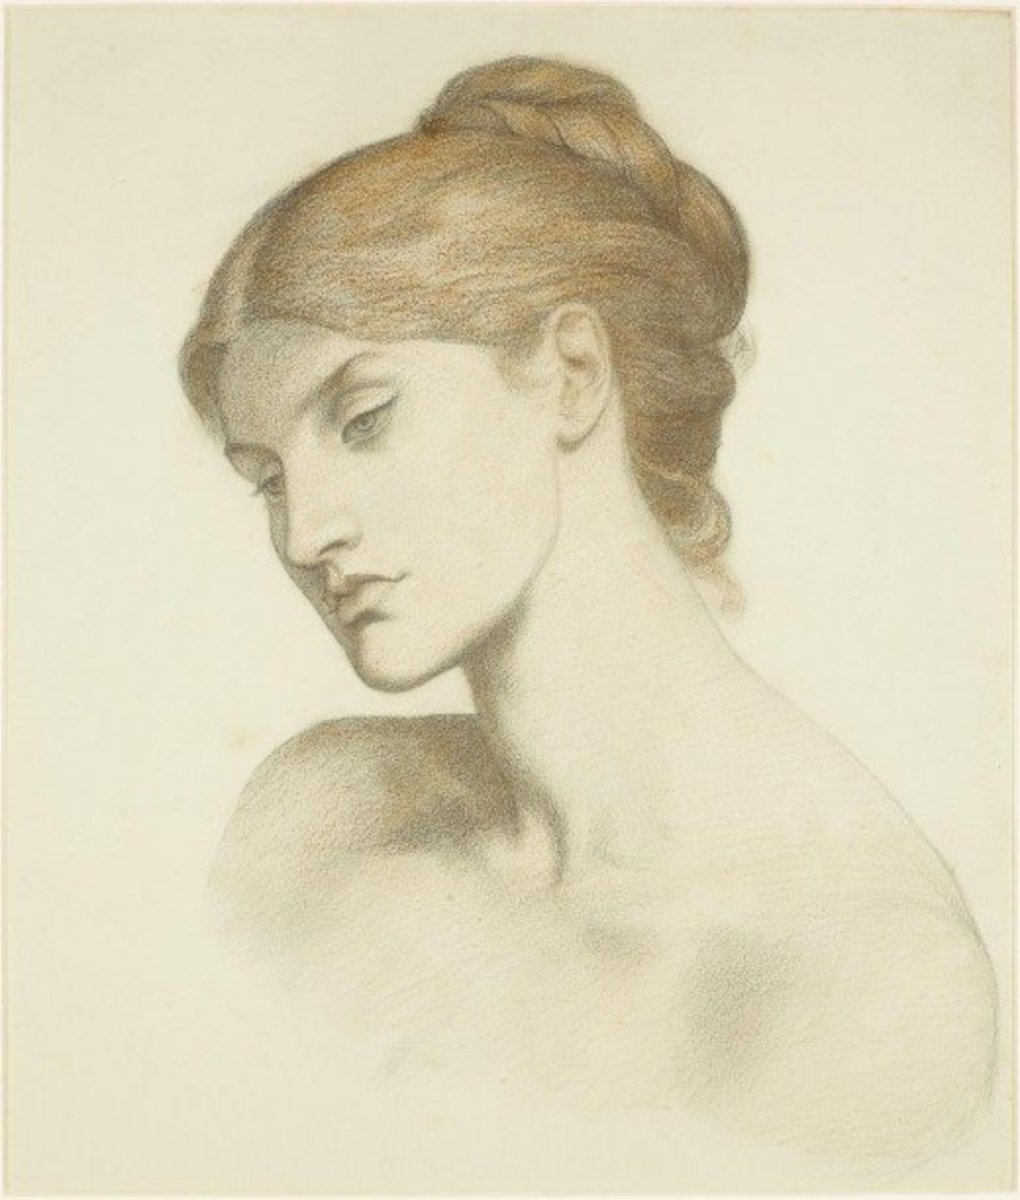 The Life of Pre-Raphaelite Art Model Alexa Wilding